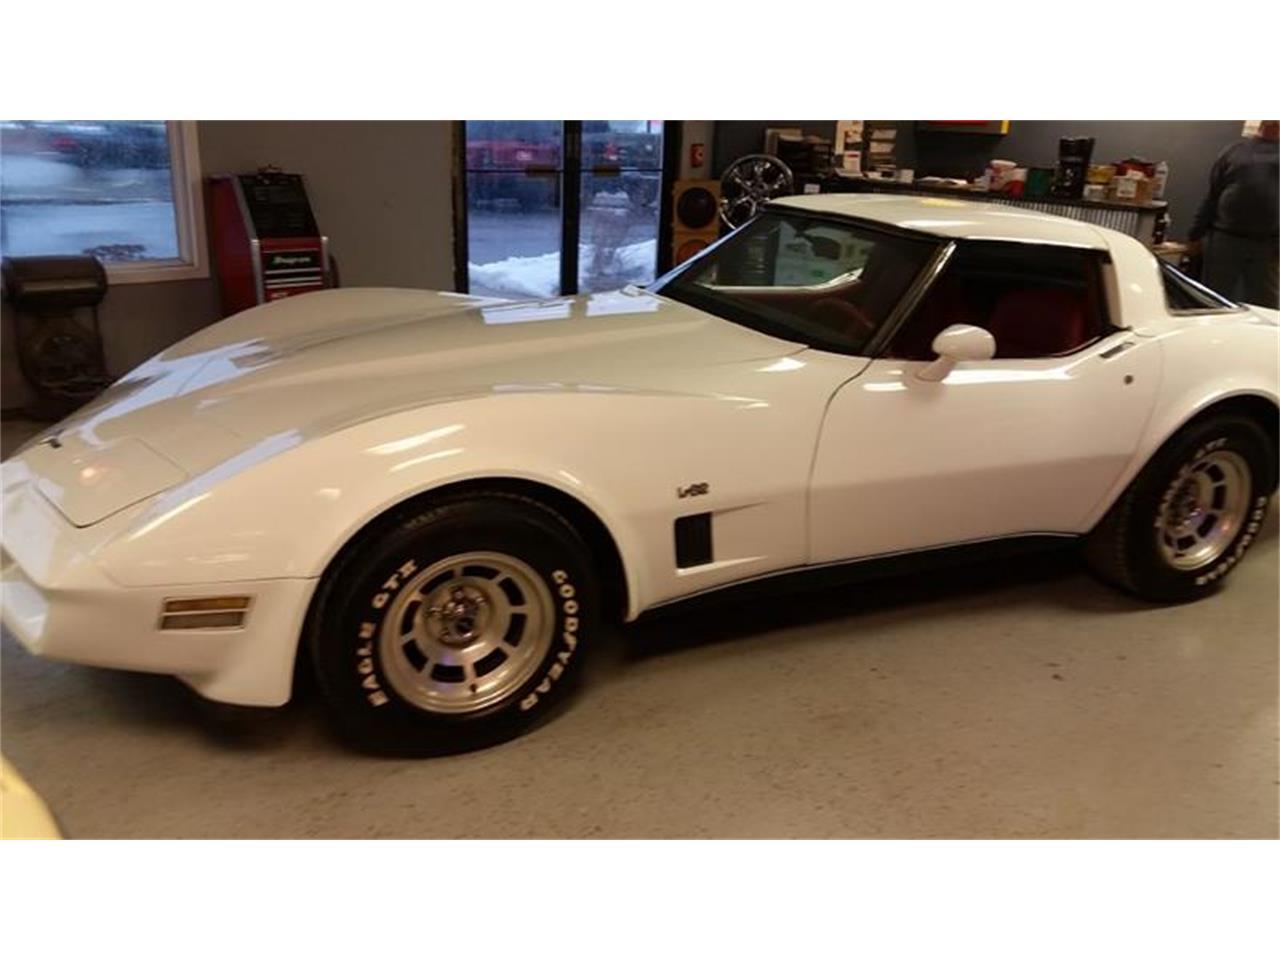 Large Picture of 1980 Chevrolet Corvette located in Iowa - $20,900.00 - PD3L